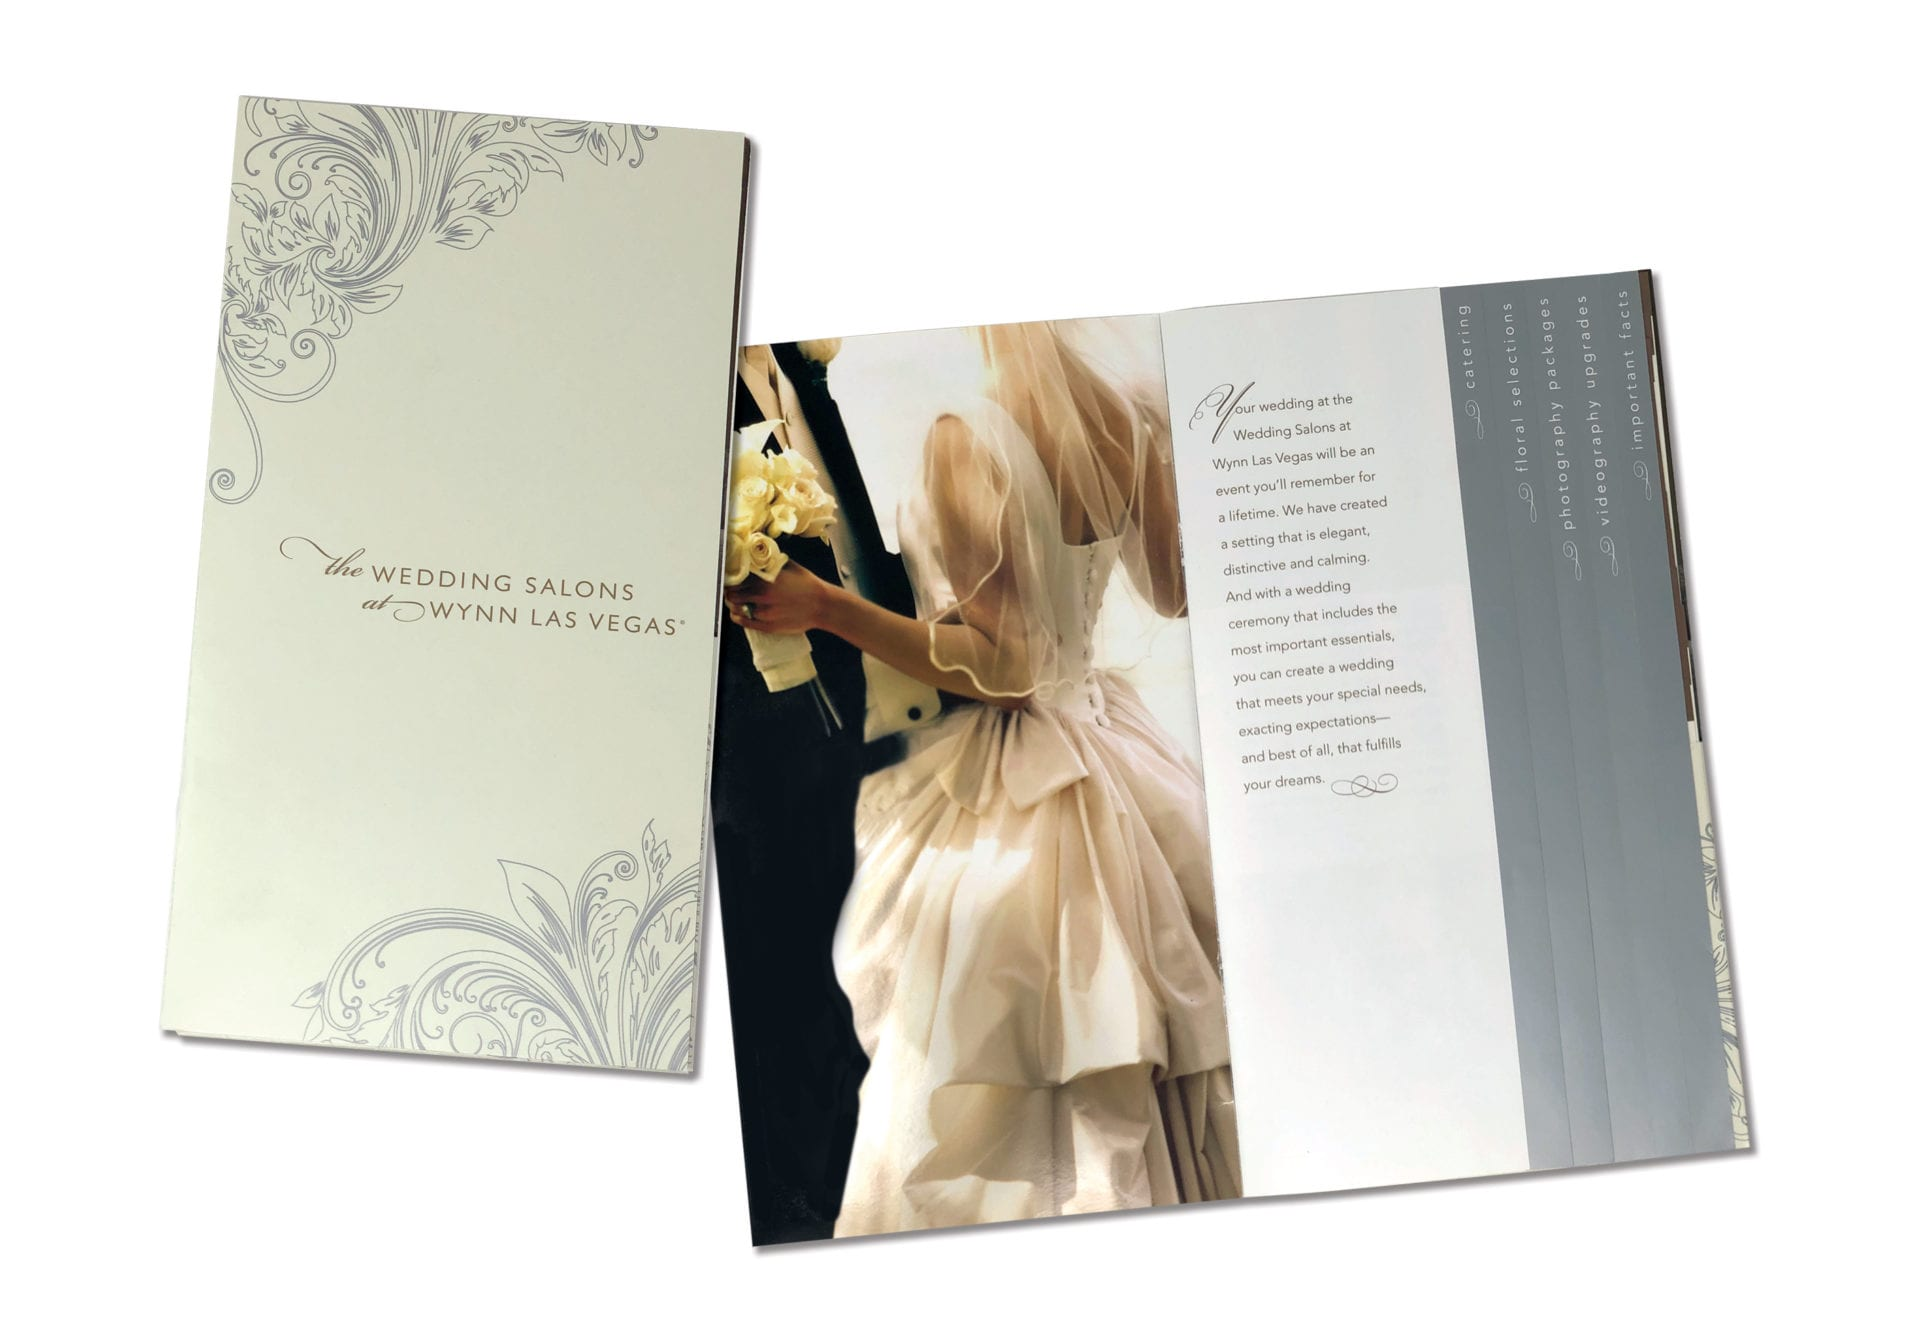 Wynn Las Vegas wedding brochure